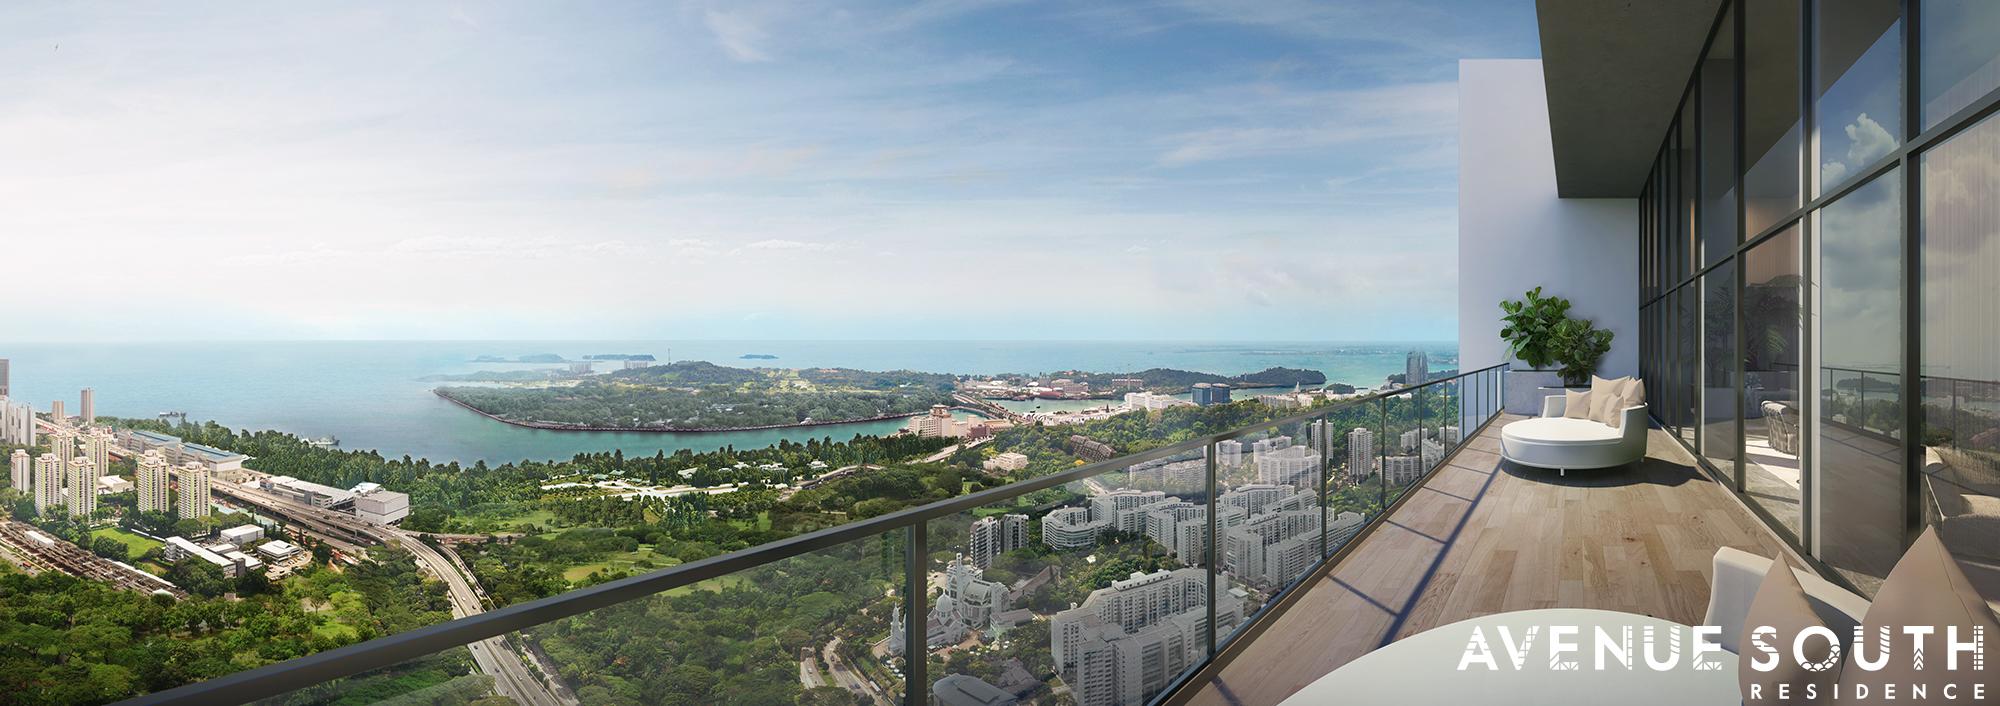 avenue-south-residence-condo-singapore